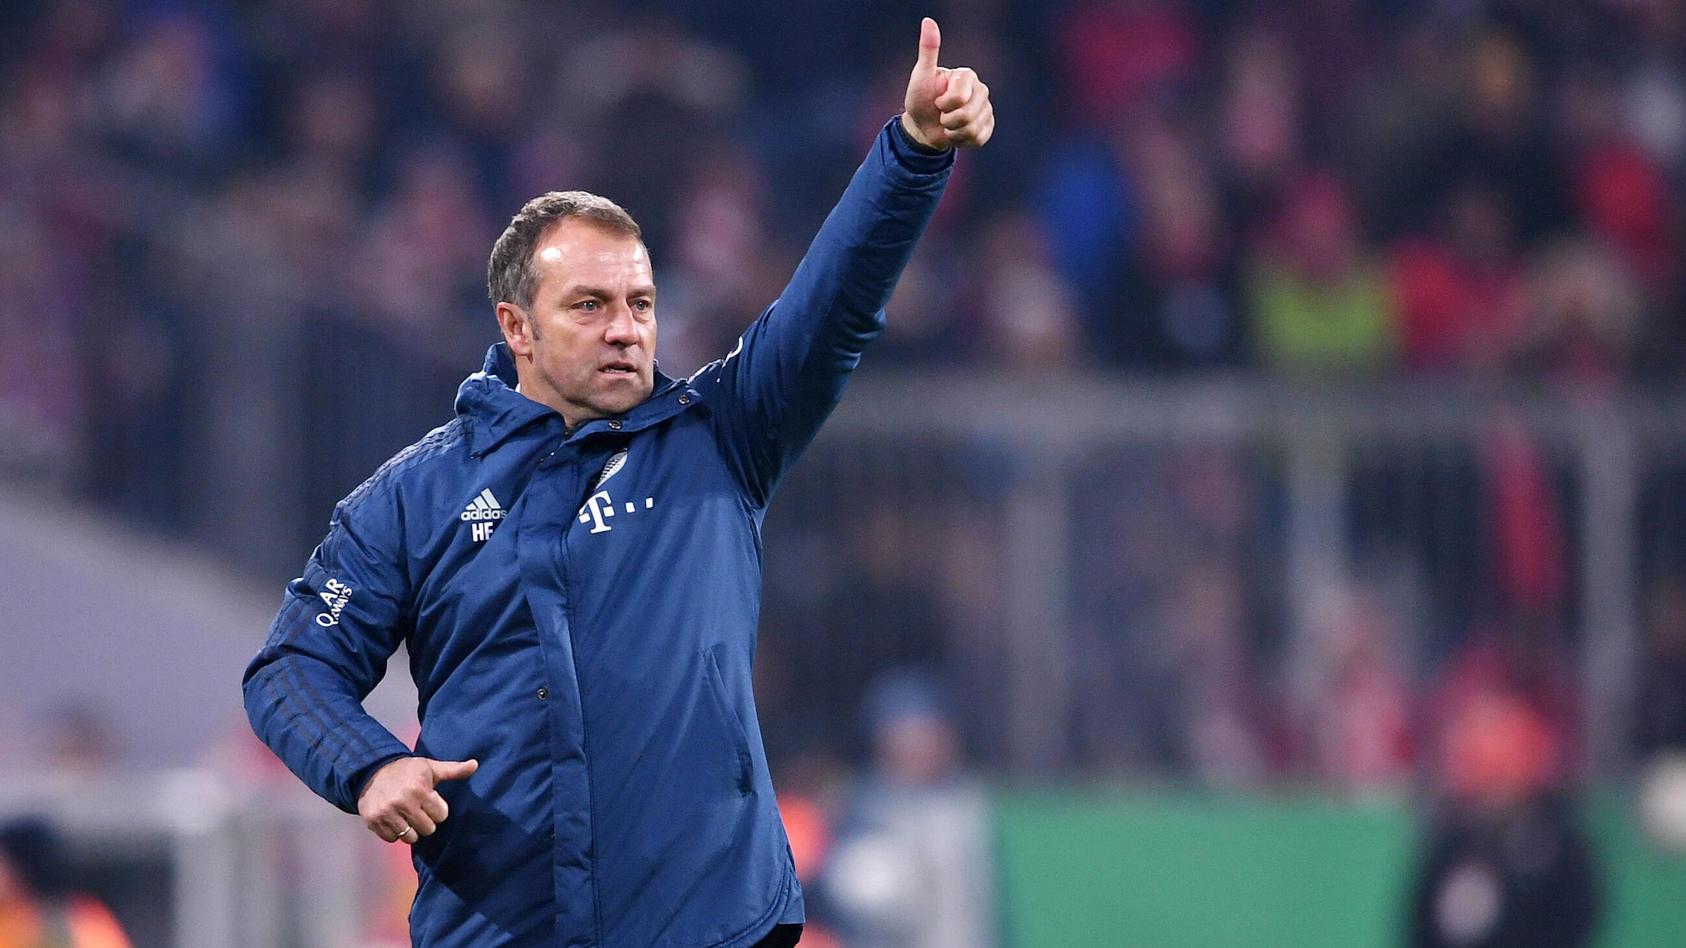 FUSSBALL DFB POKAL ACHTELFINALE SAISON 2019/2020 FC Bayern Muenchen - TSG 1899 Hoffenheim 05.02.2020 JUBEL Trainer Hans